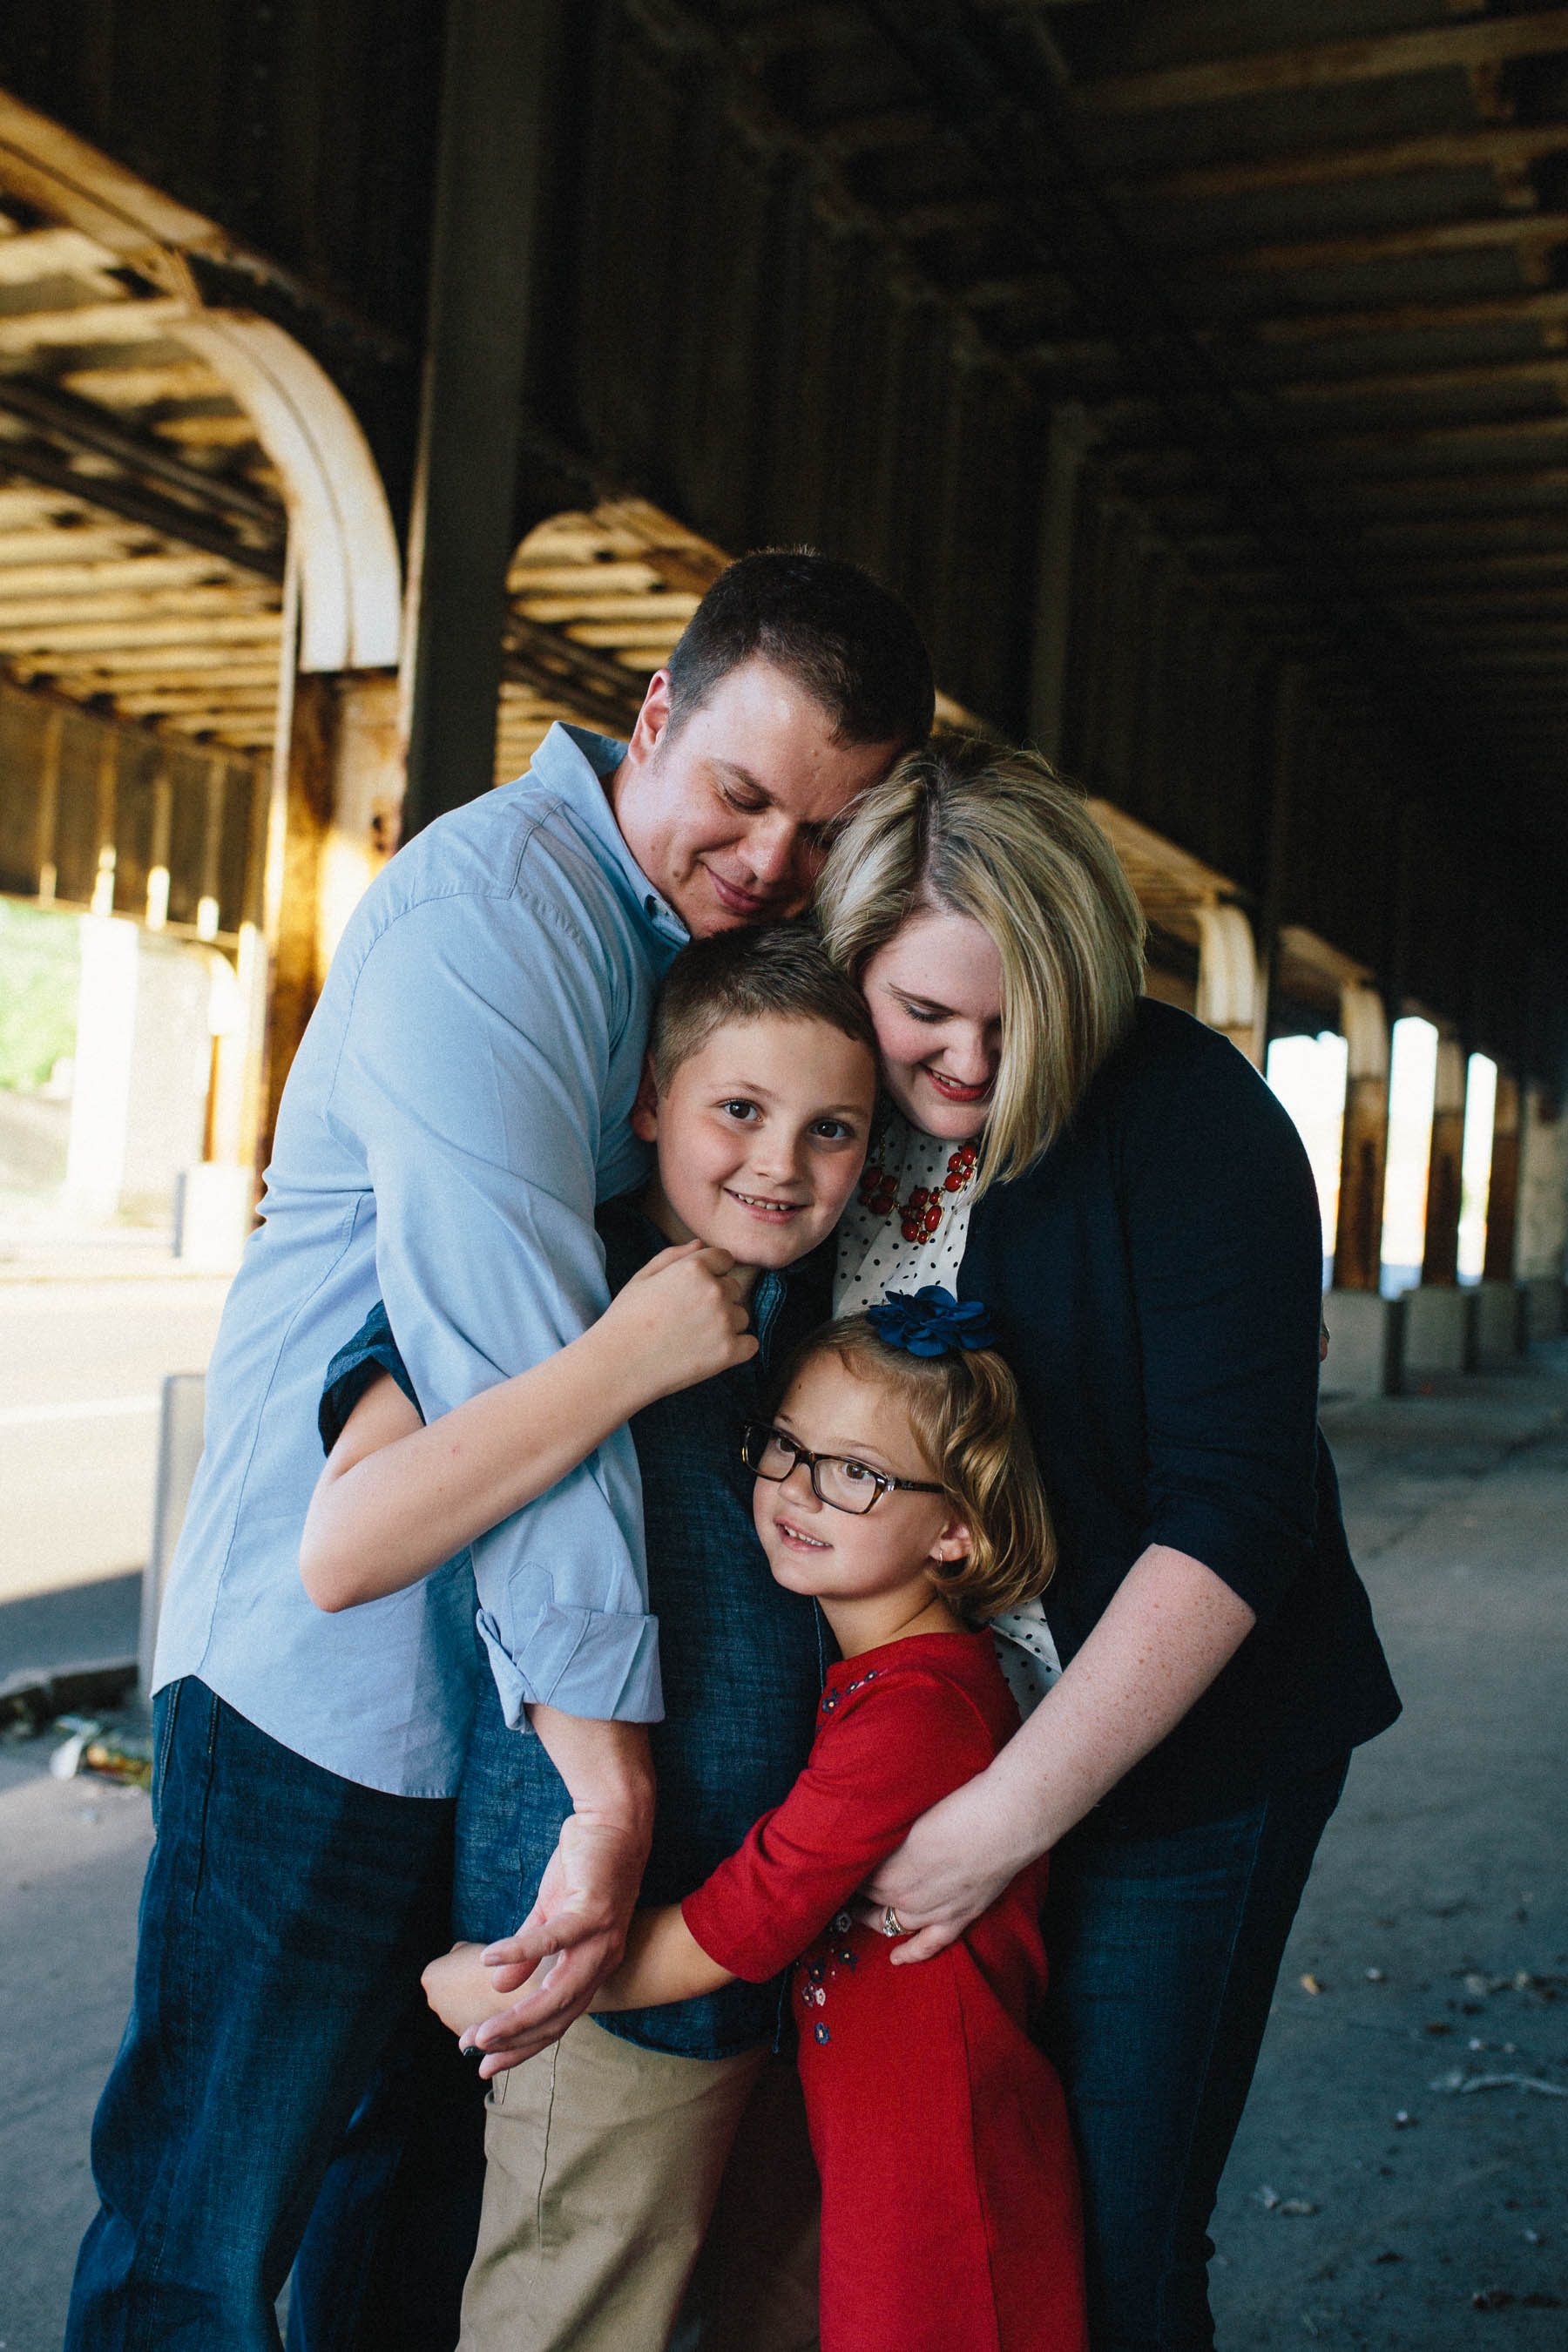 brooklyn-nyc-chicago-family-photographer-48.jpg